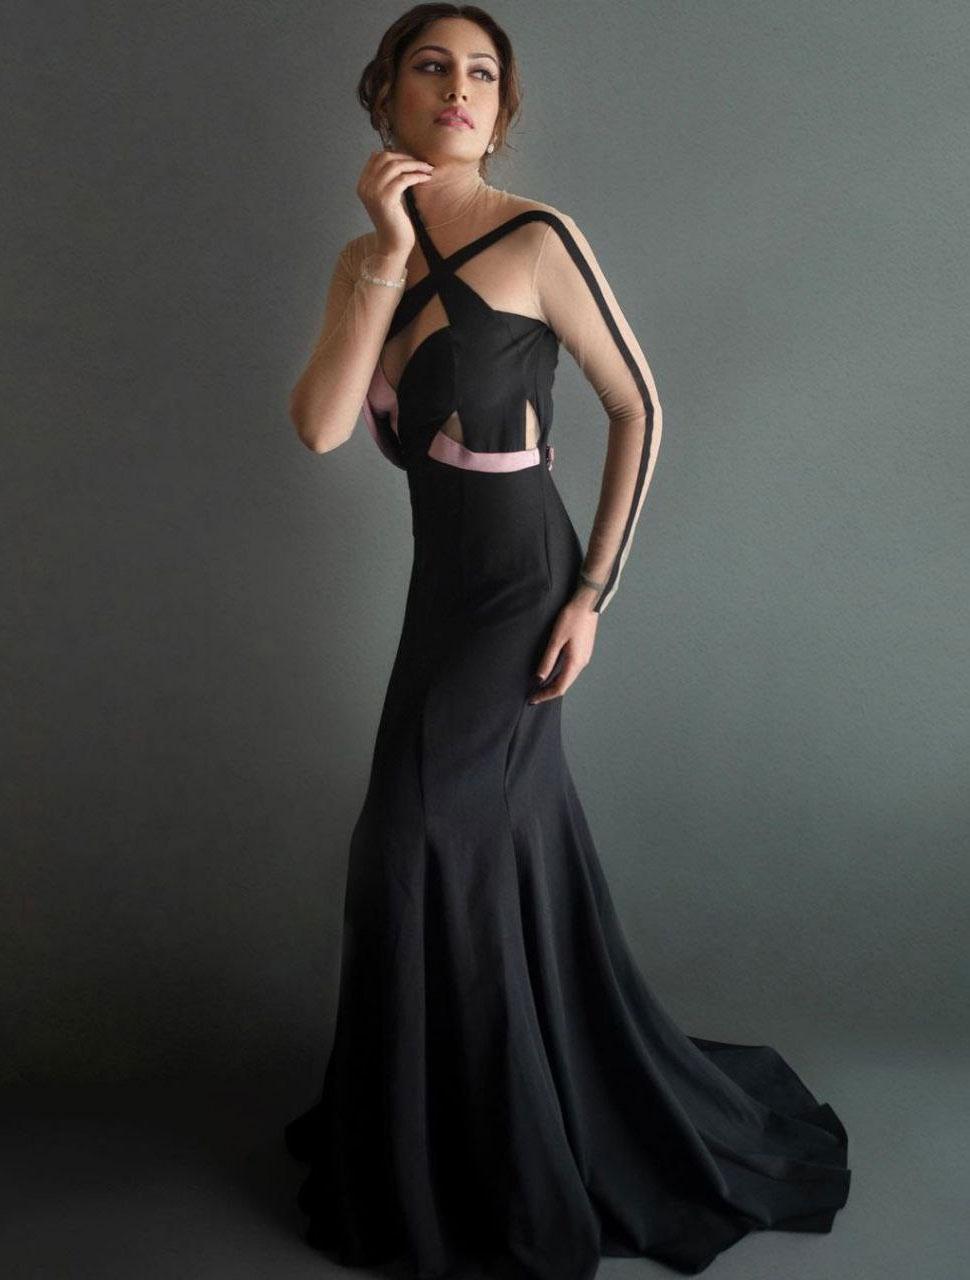 Surbhi Chandna in gorgeous dress